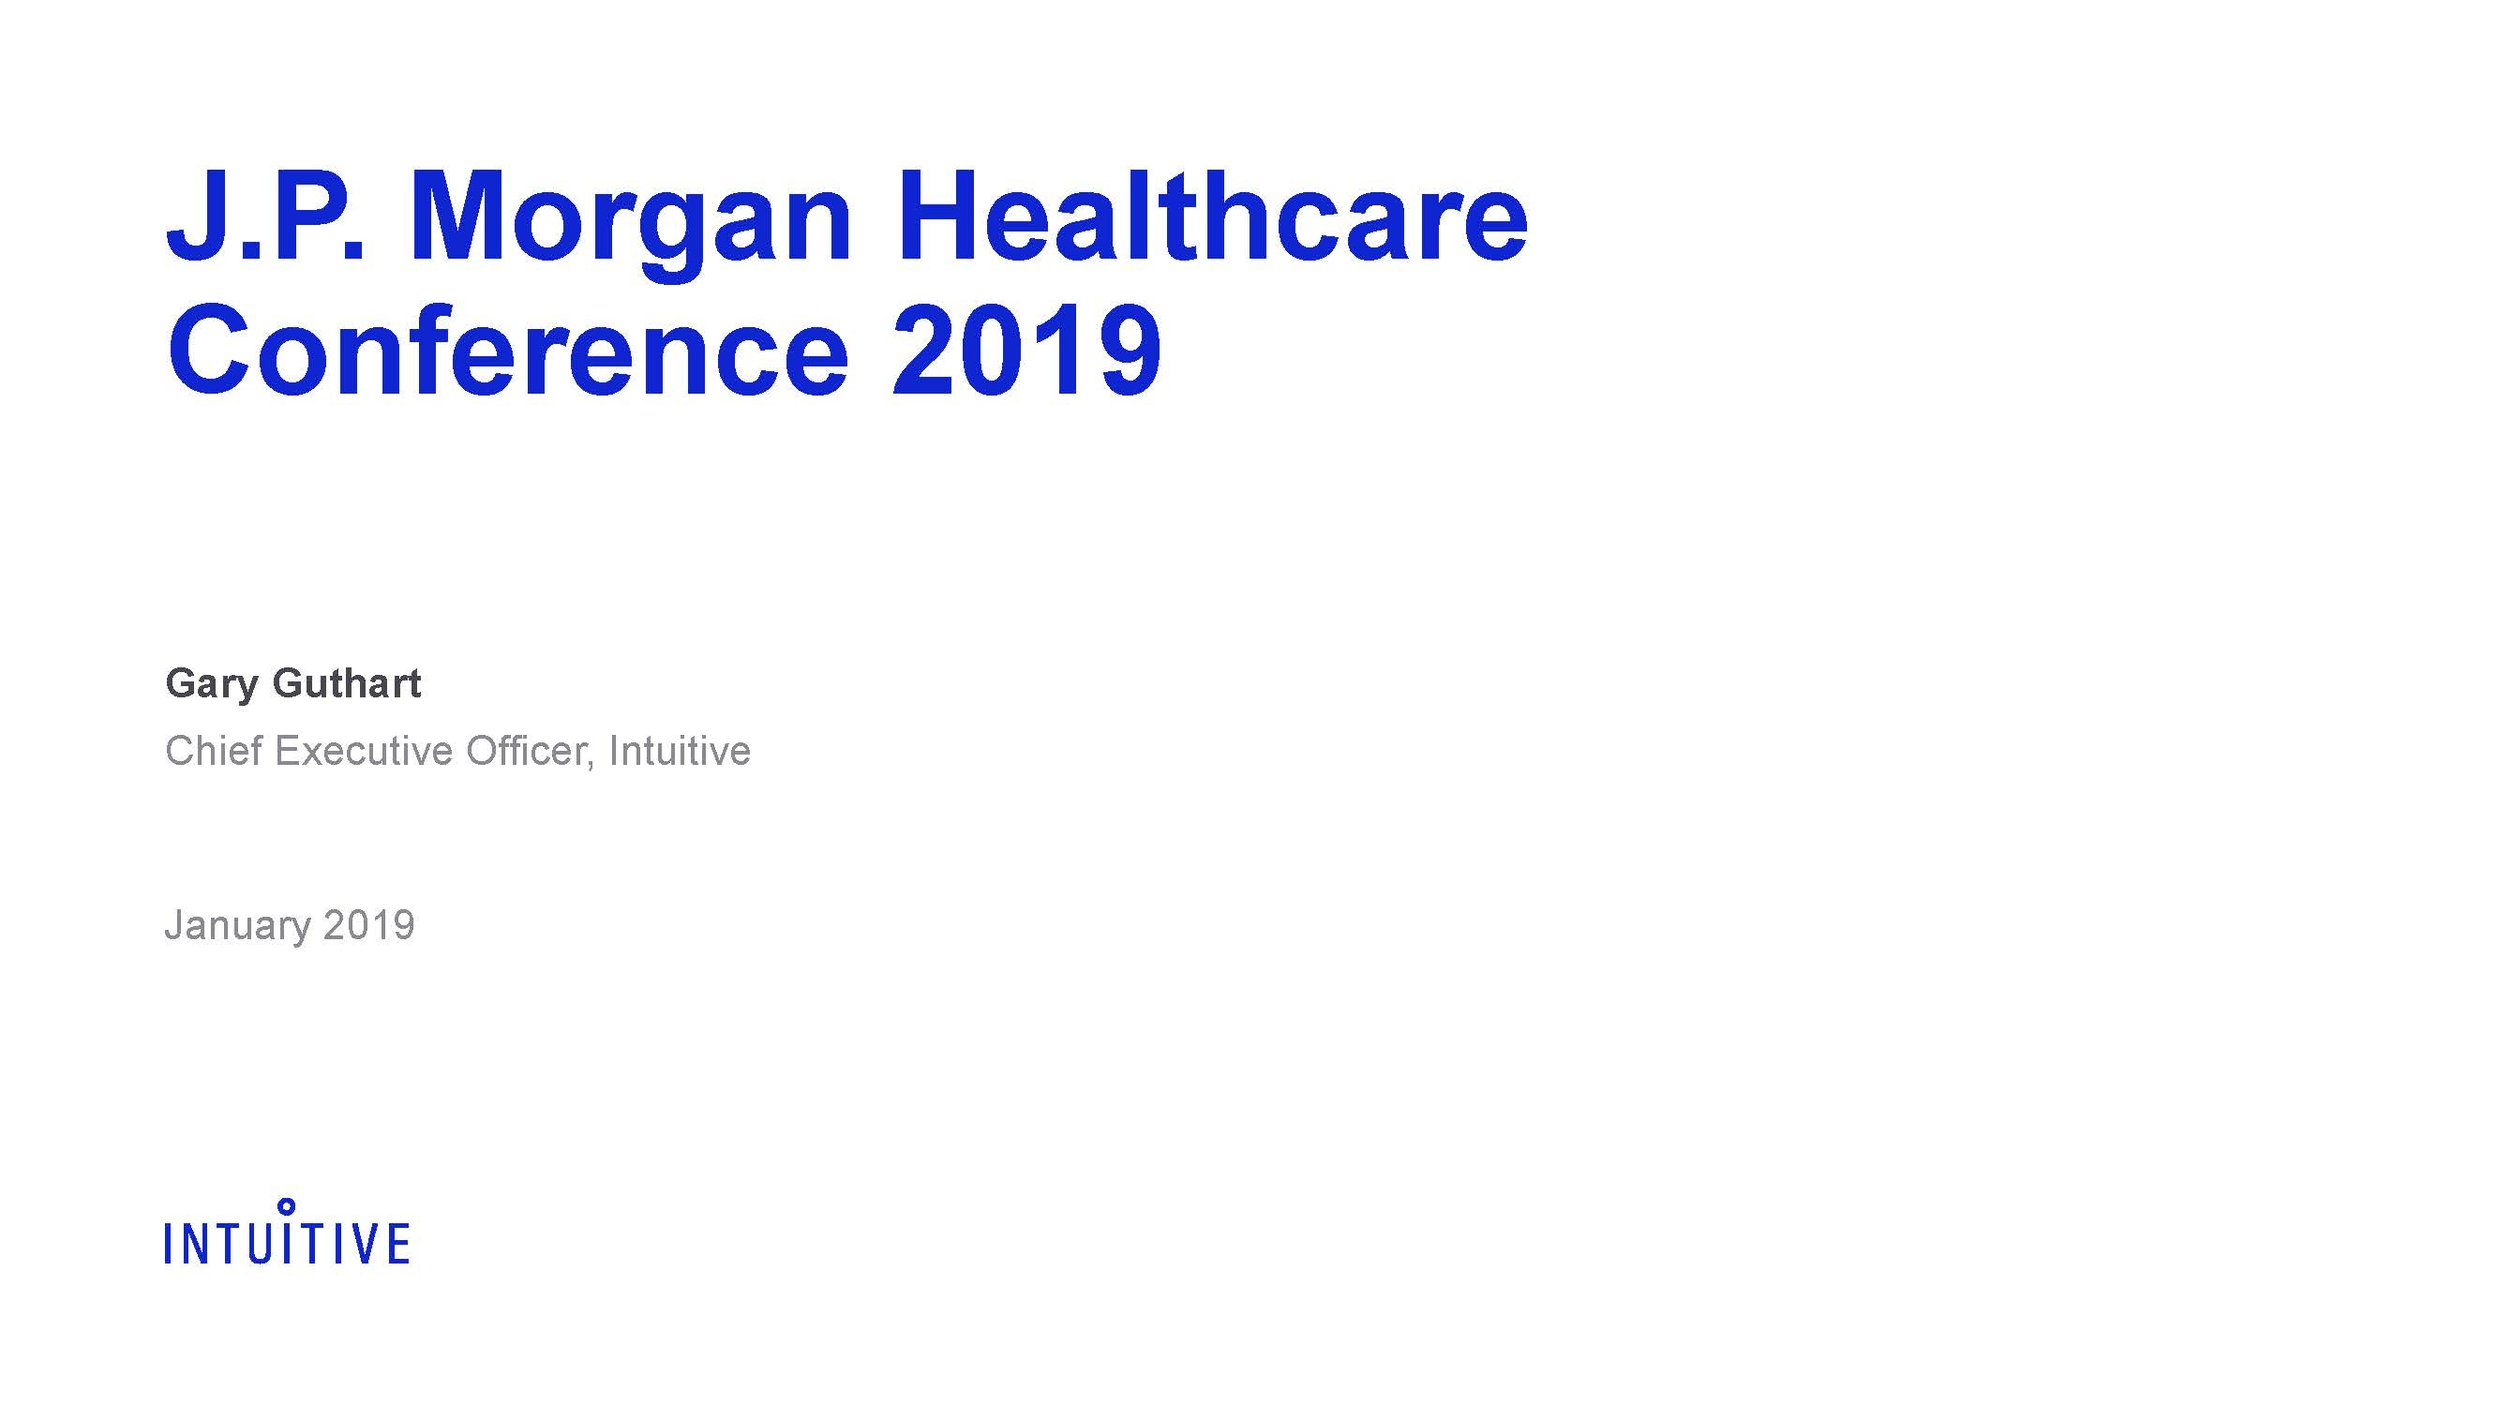 JPMorgan2019 Website_Page_01.jpg